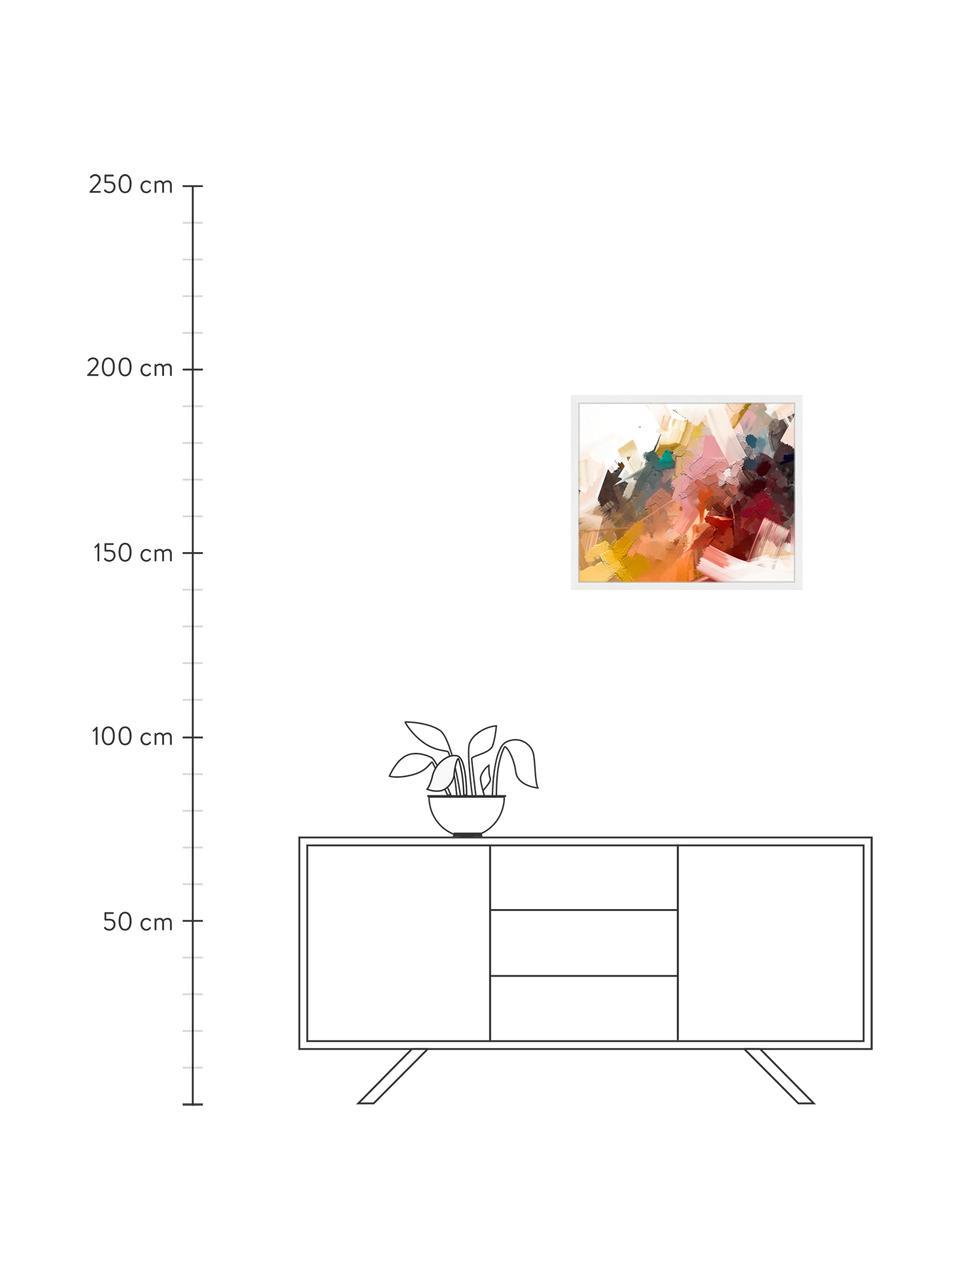 Gerahmter Digitaldruck Abstract Colorful Oil Painting, Bild: Digitaldruck auf Papier, , Rahmen: Holz, lackiert, Front: Plexiglas, Mehrfarbig, 63 x 53 cm